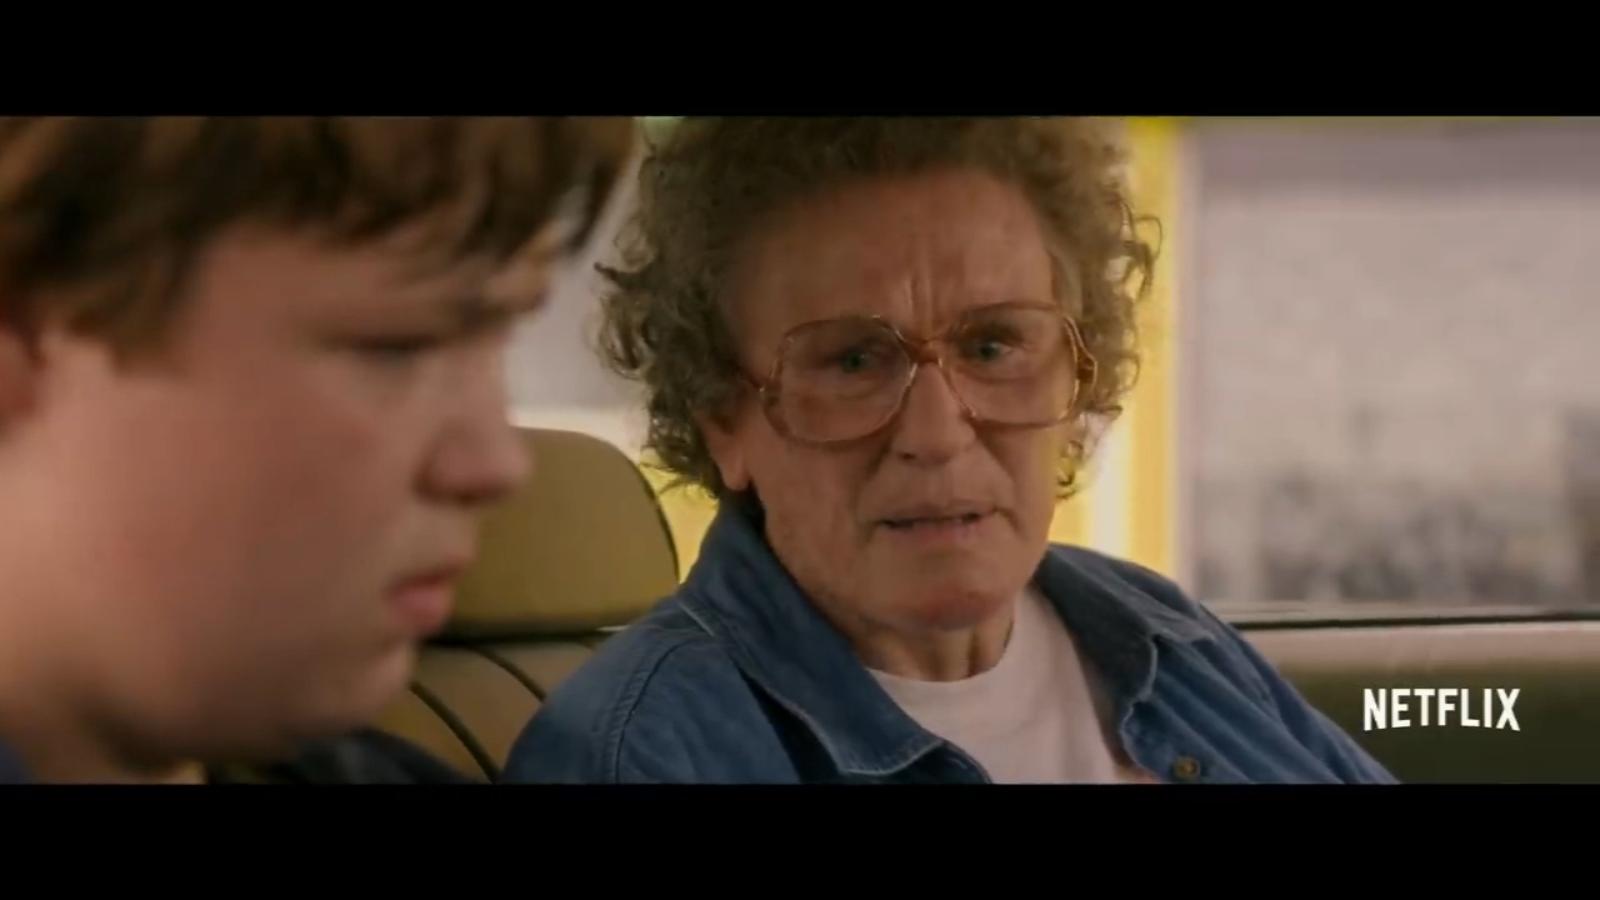 'Hillbilly Elegy' revives Oscar hopes for longtime contenders Glenn Close, Amy Adams